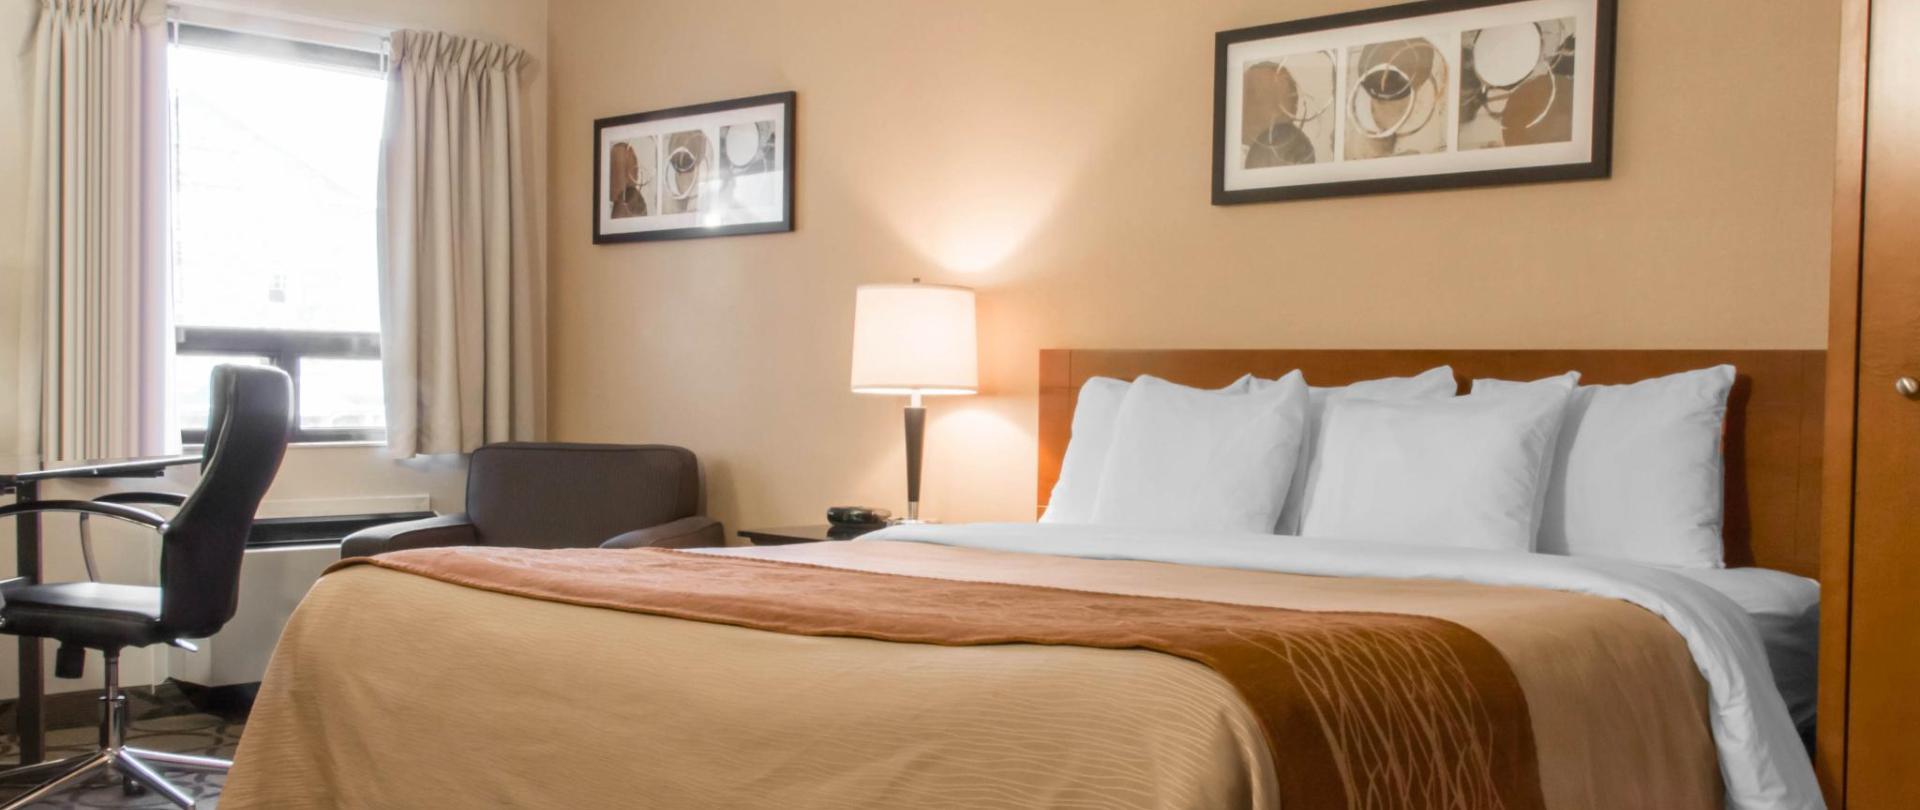 Pillowtop Queen Guestroom.jpg